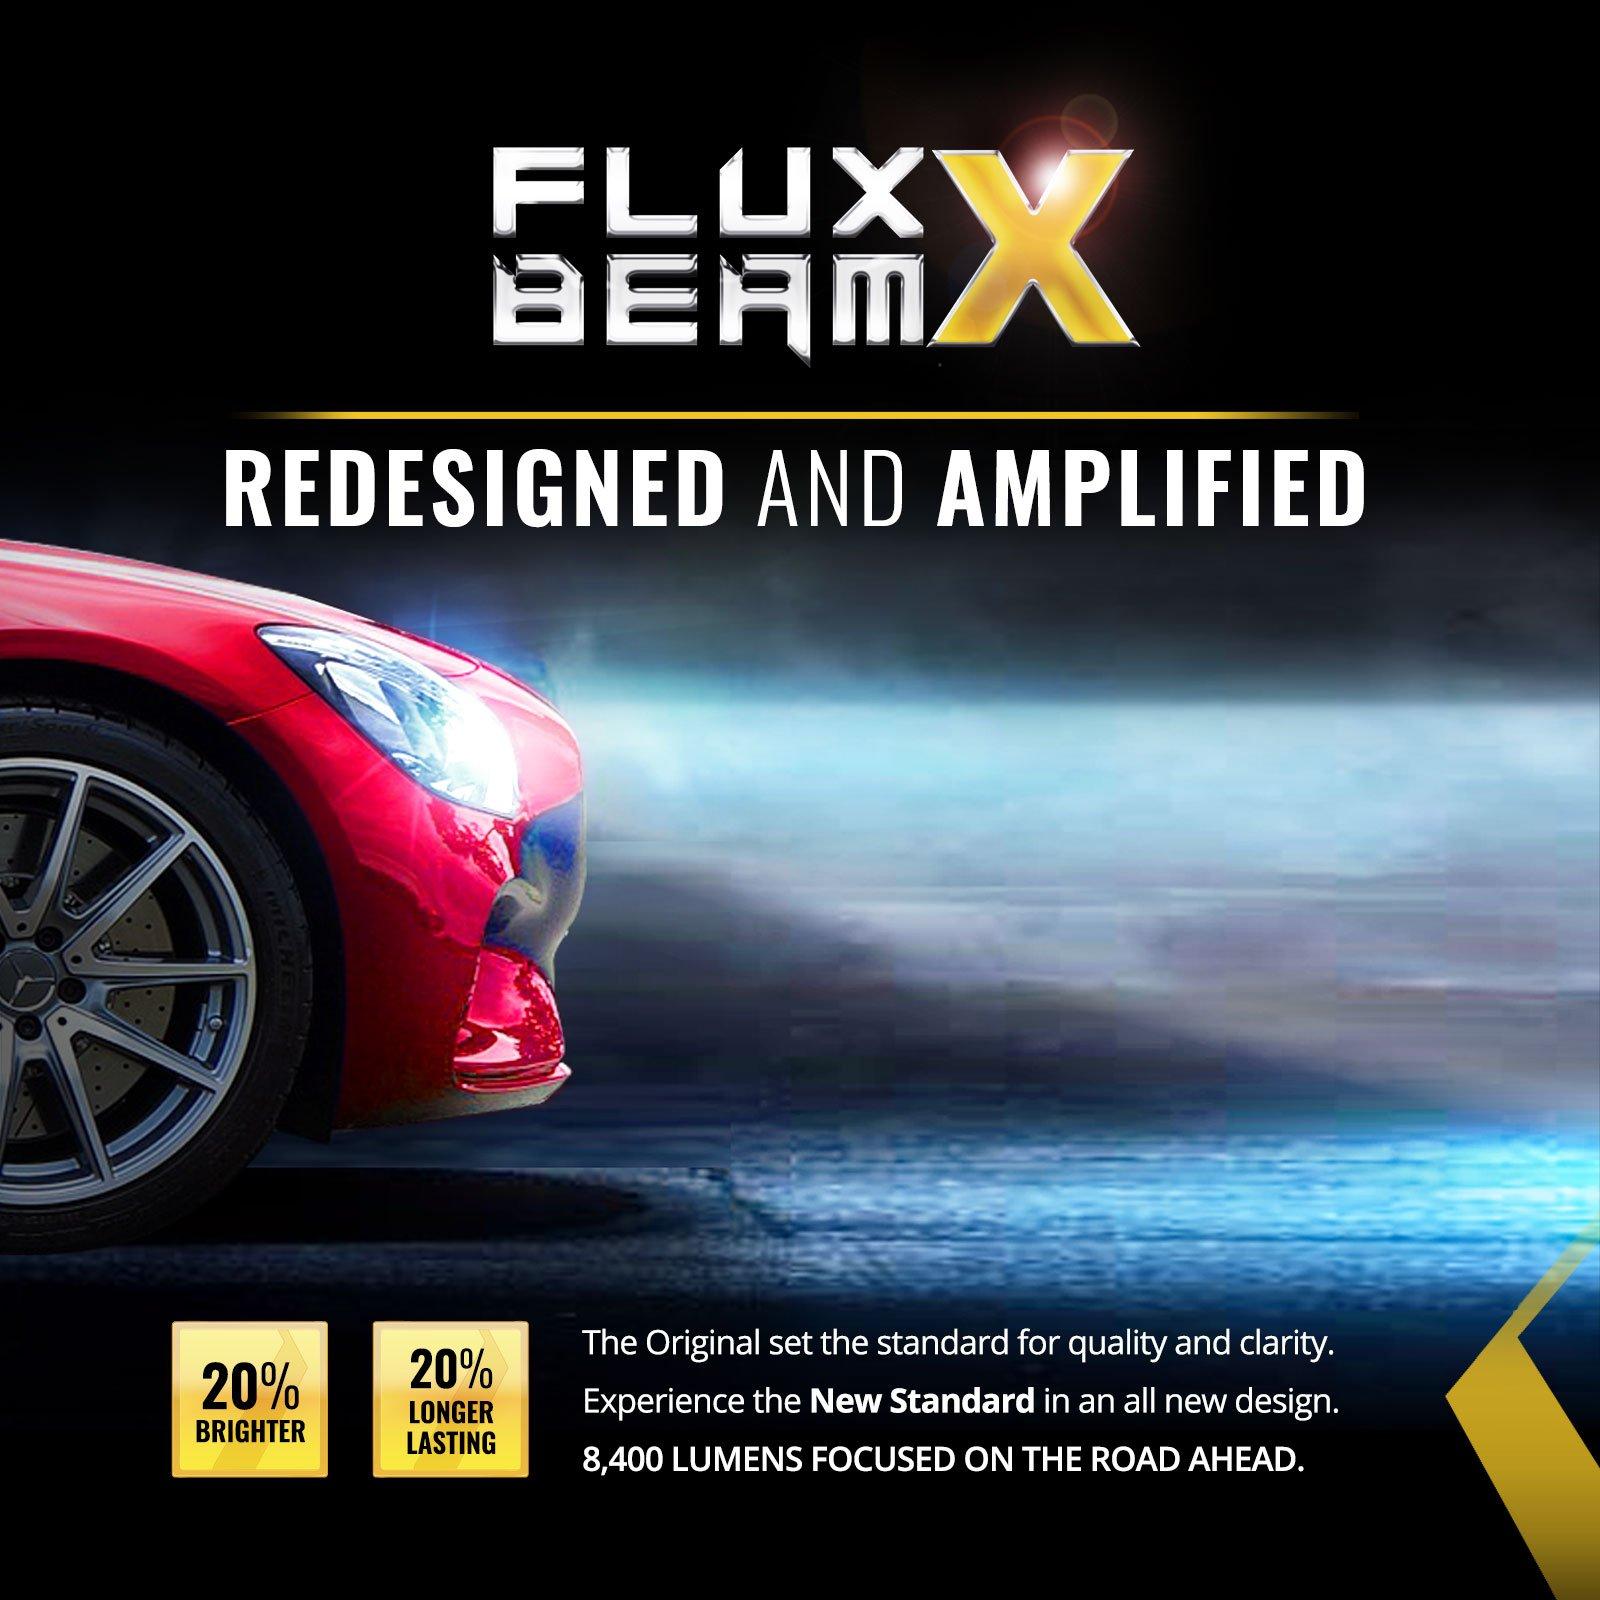 OPT7 Fluxbeam X 9007 LED Headlight Bulbs w/Arc-Beam Lens - 8,400LM 6000K Daytime White - All Bulb Sizes - 80w - 2 Year Warranty by OPT7 (Image #2)